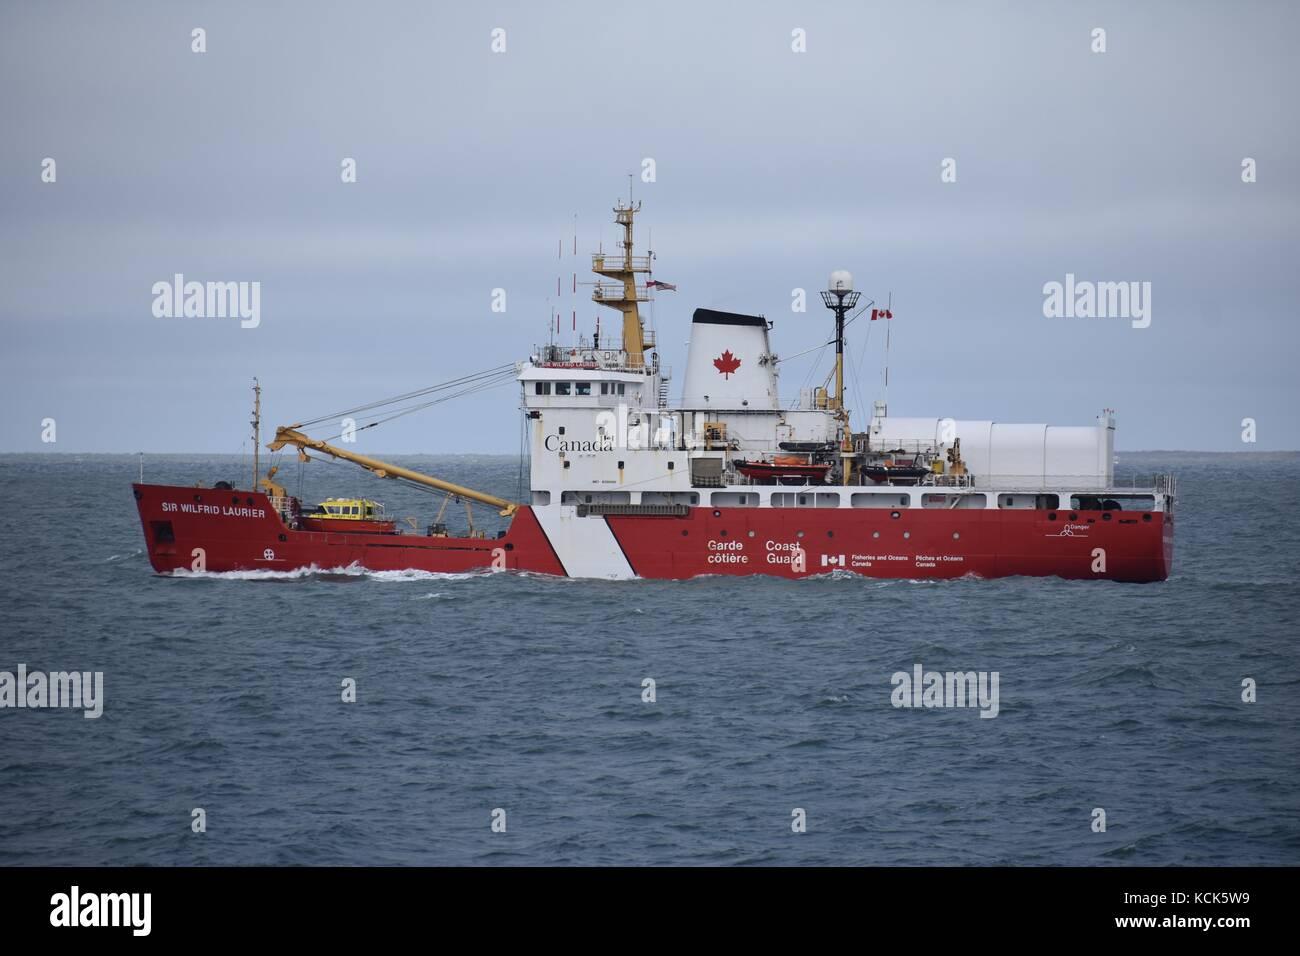 The Canadian Coast Guard Martha L. Black-class light icebreaker vessel CCGS Sir Wilfrid Laurier steams underway - Stock Image